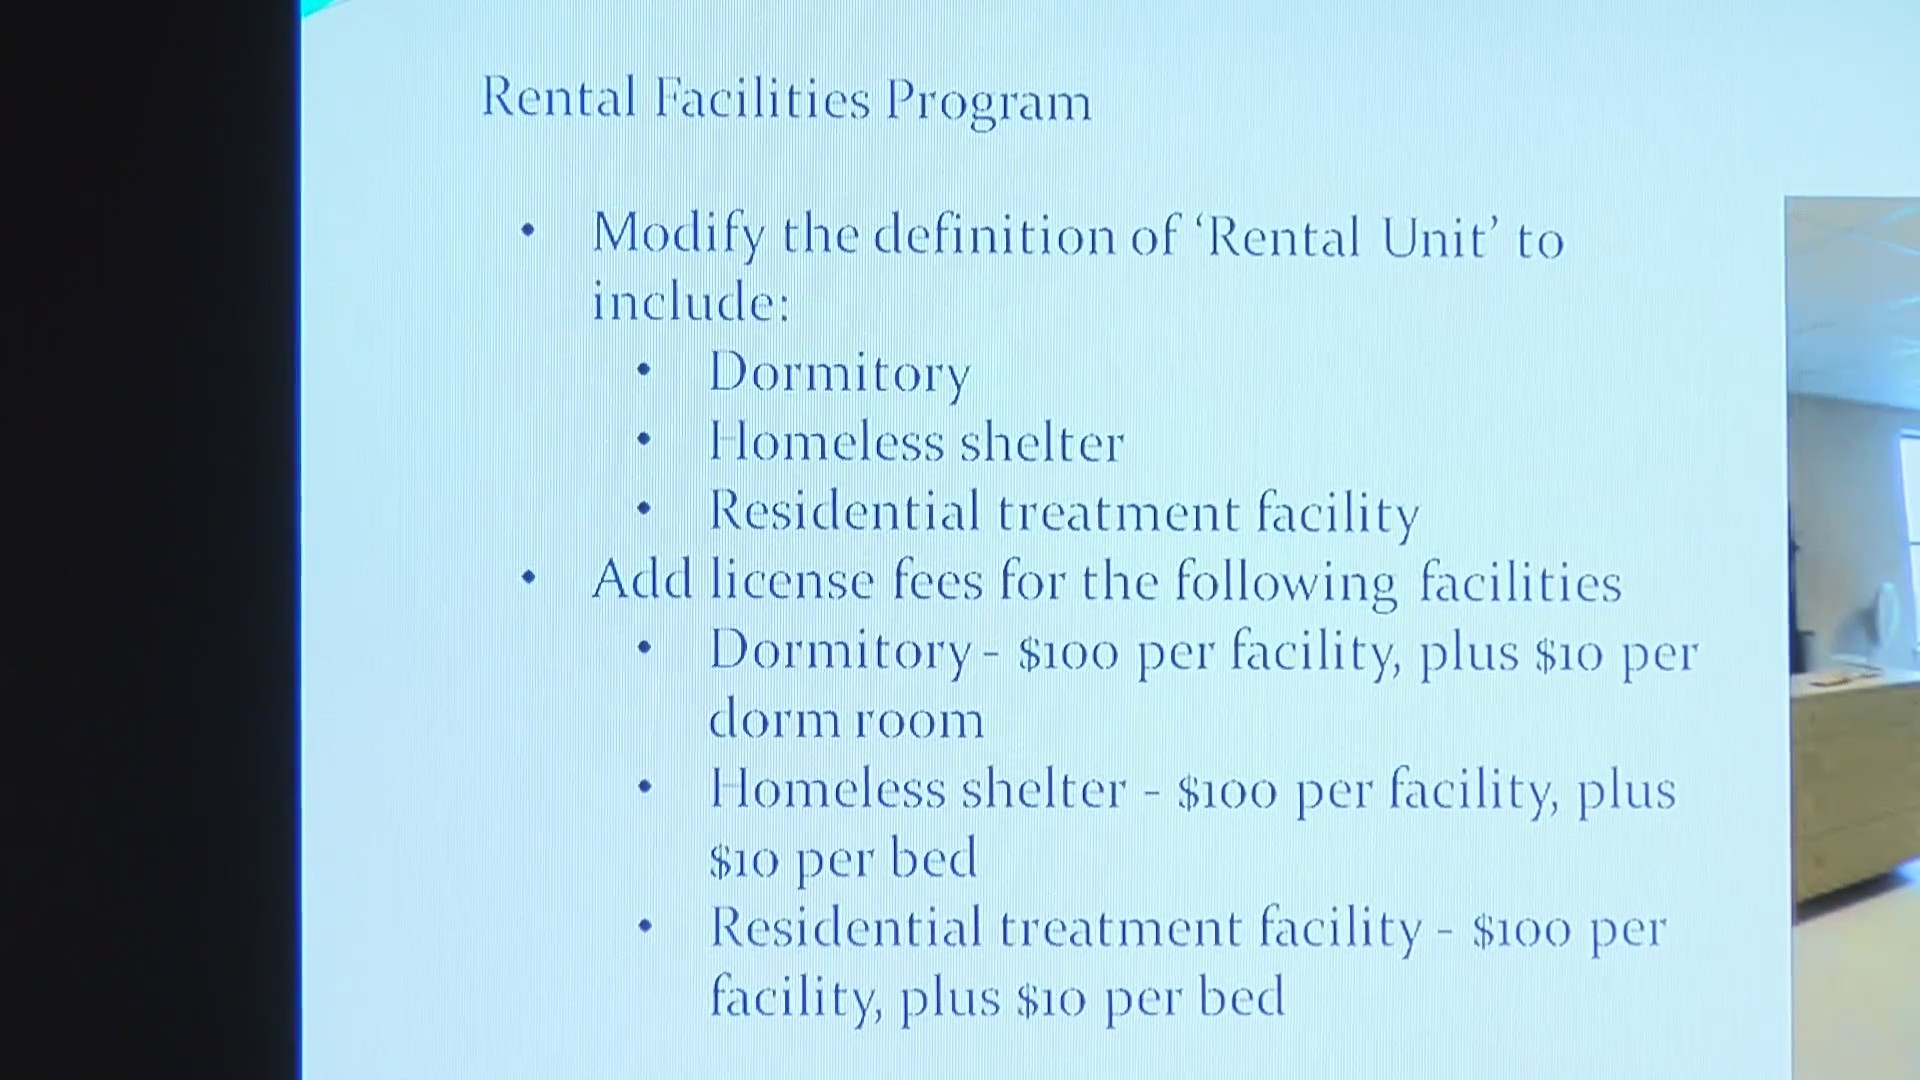 Rental_facilities_program_0_20180404021215